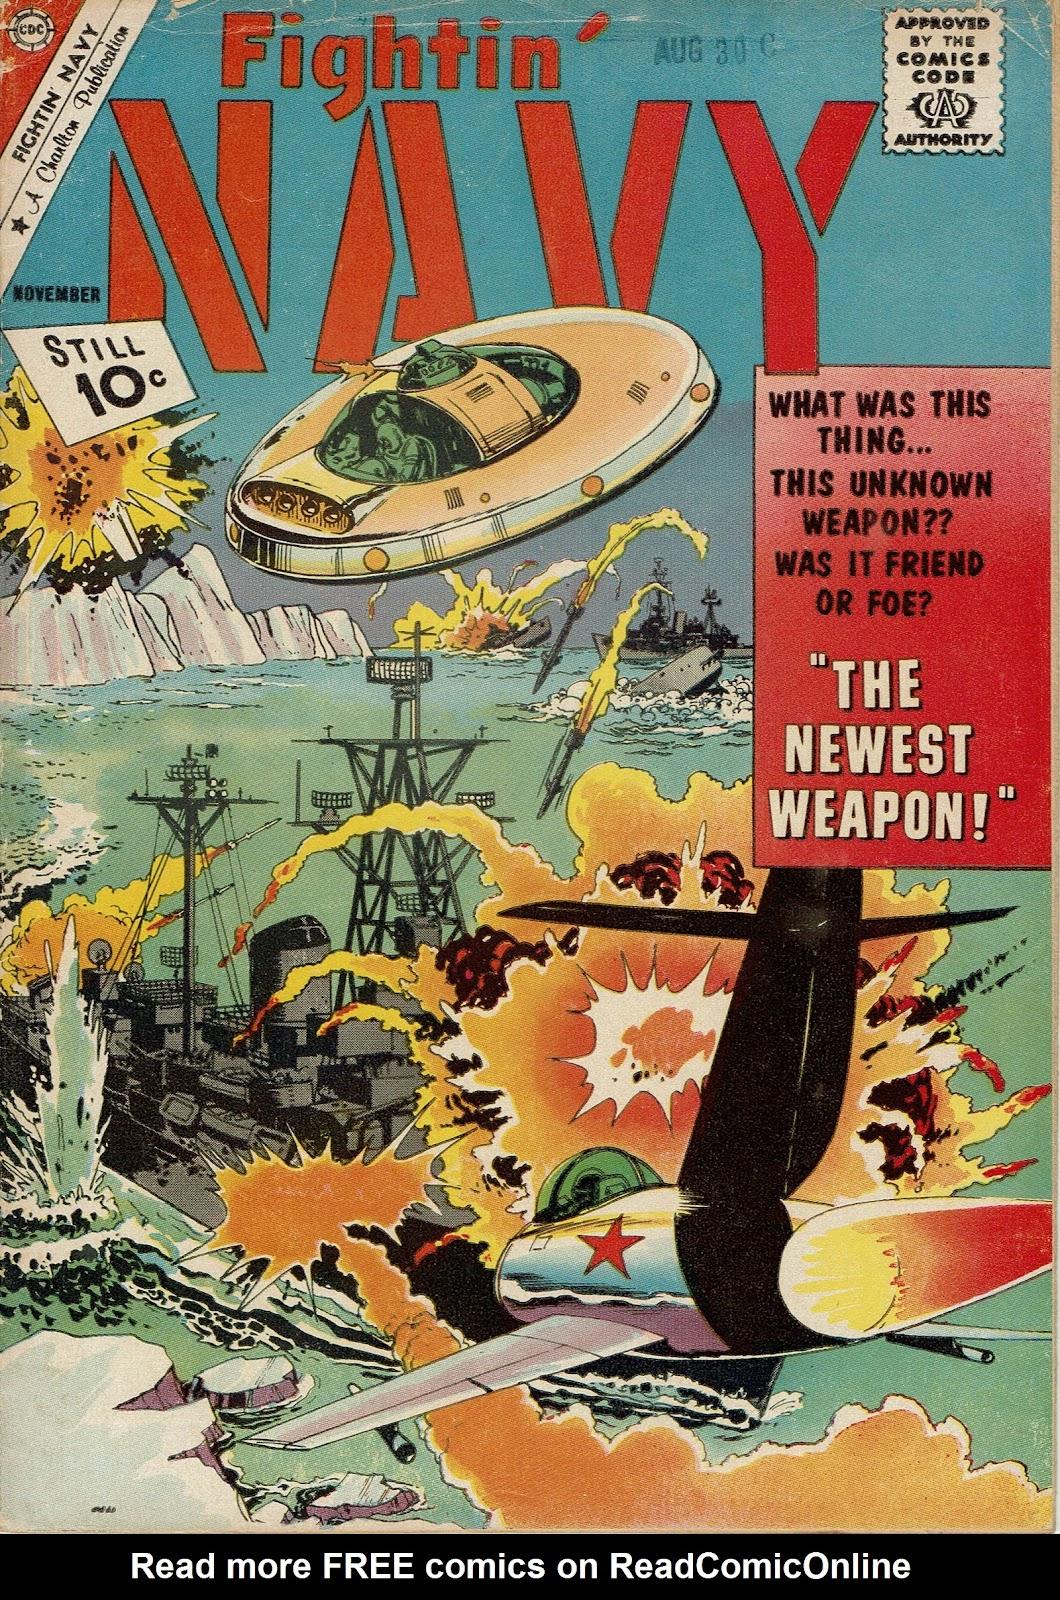 Read online Fightin' Navy comic -  Issue #101 - 1